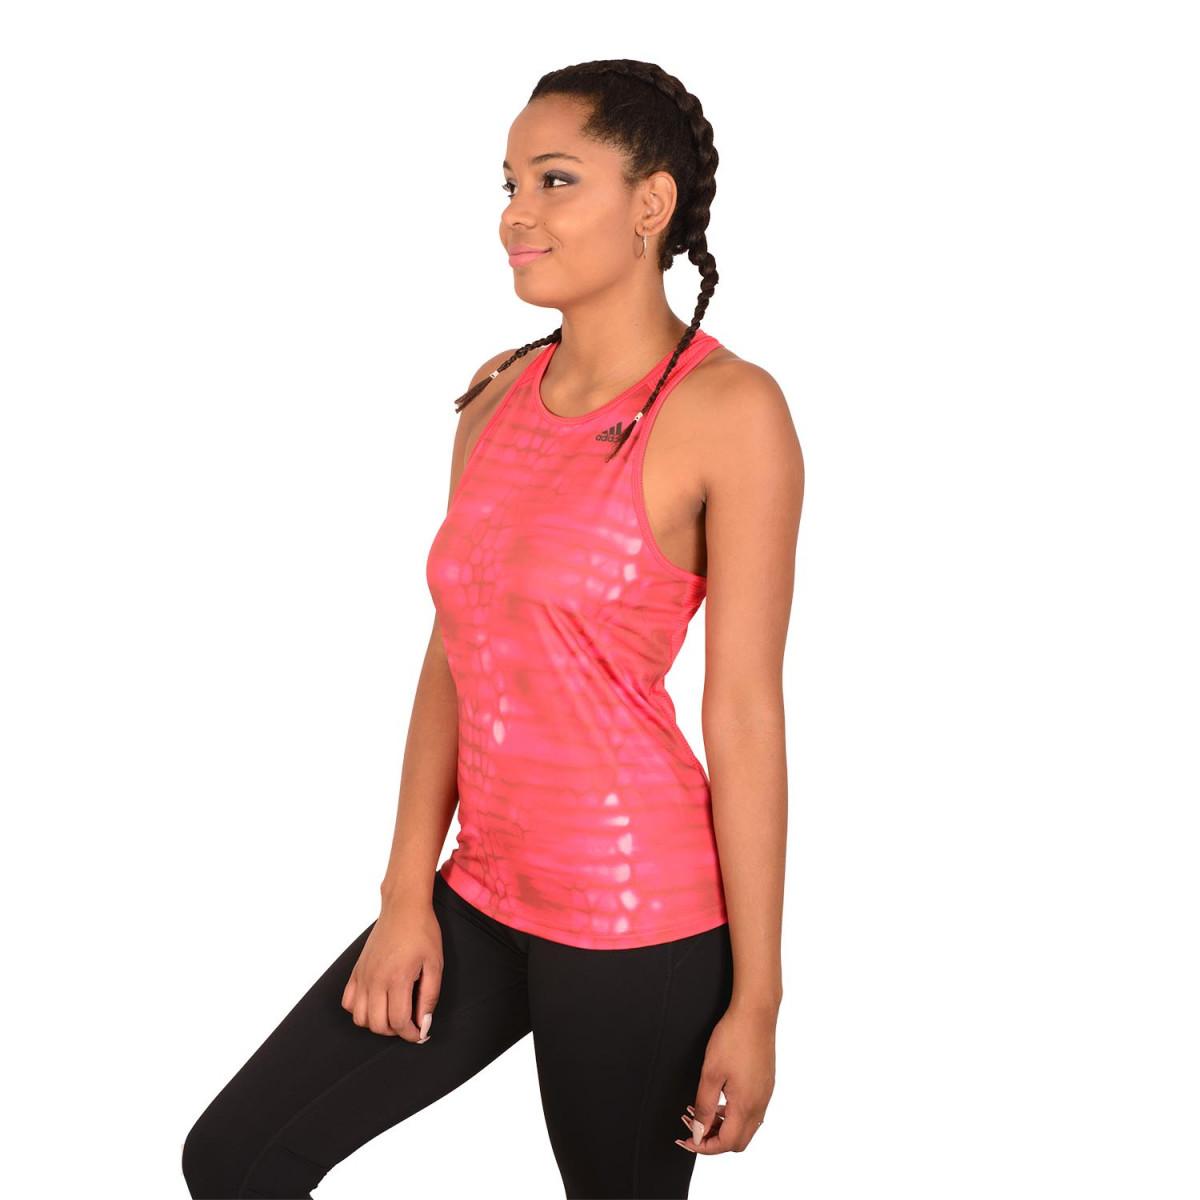 Musculosa Adidas Nex Generation